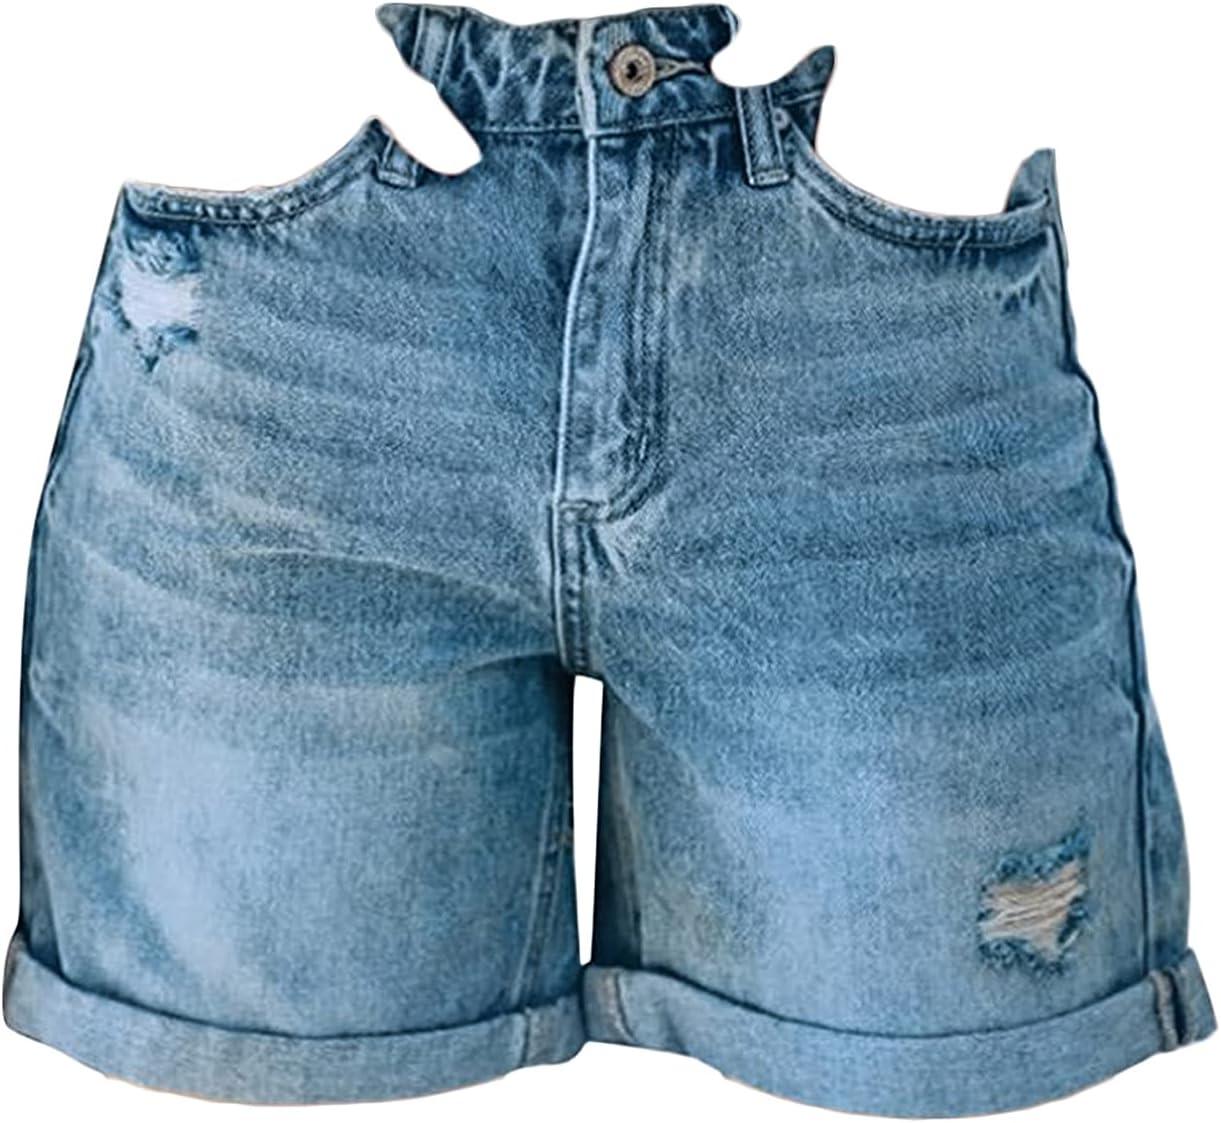 Women's Classic Rolled Hem Jean Shorts High Waist Distressed Ripped Short Jeans Cuffed Straight Leg Holes Denim Shorts (Blue,Medium)